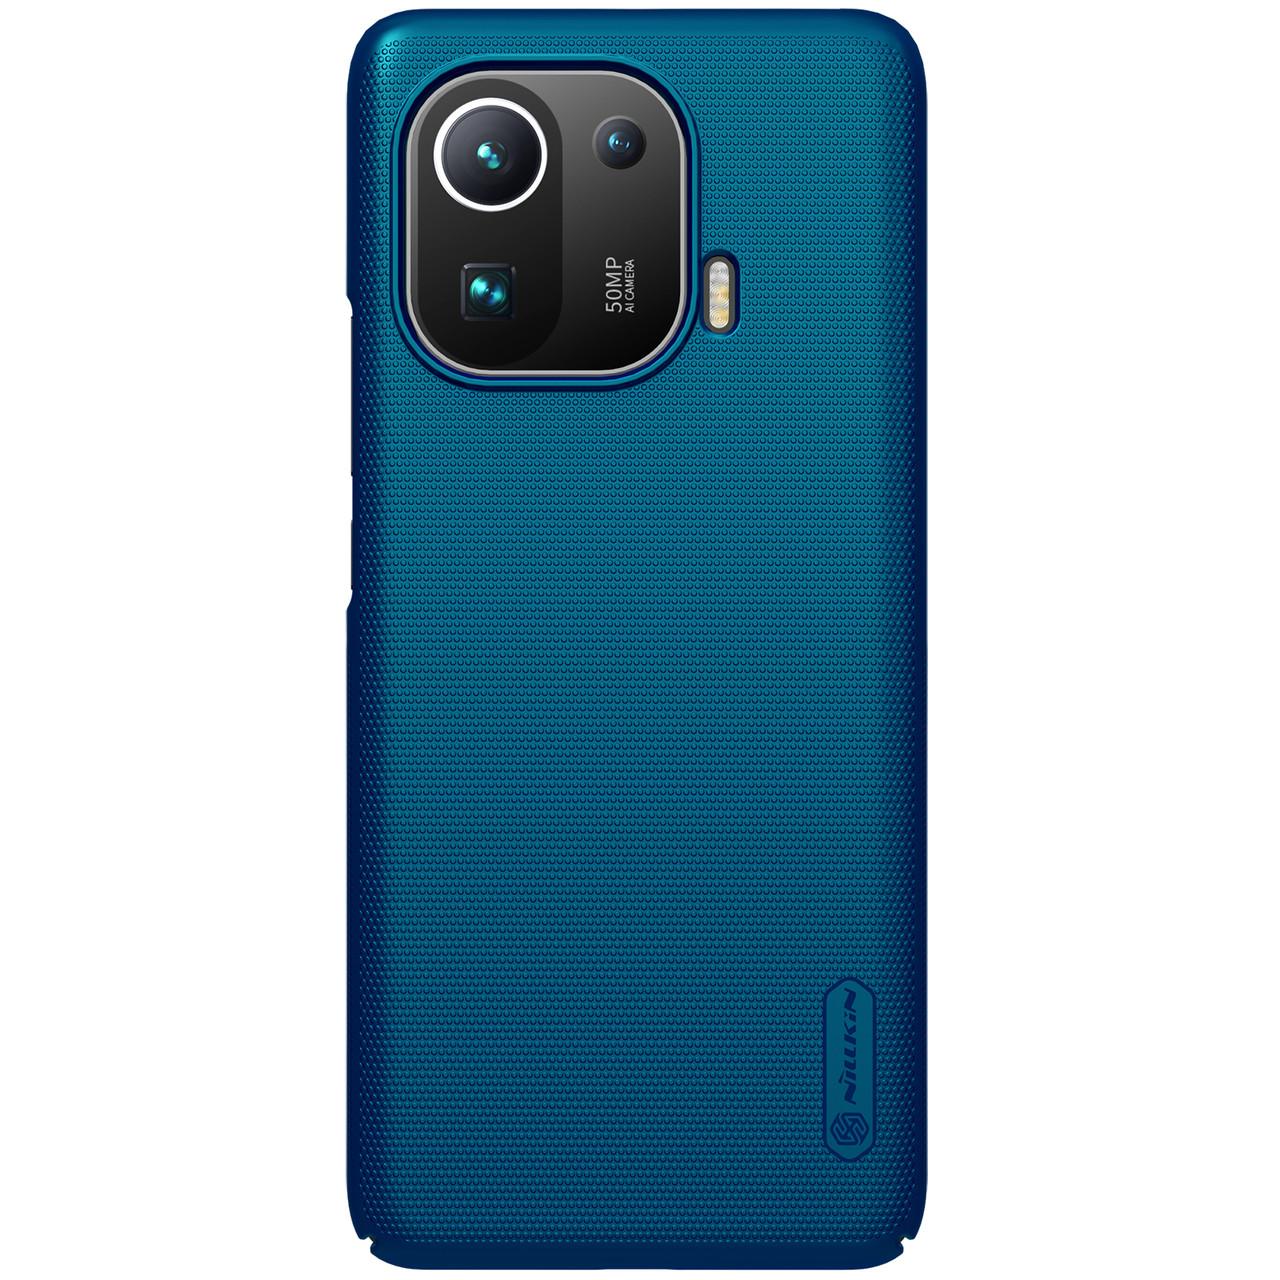 Защитный чехол Nillkin для Xiaomi Mi 11 Pro Super Frosted Shield Blue Синий